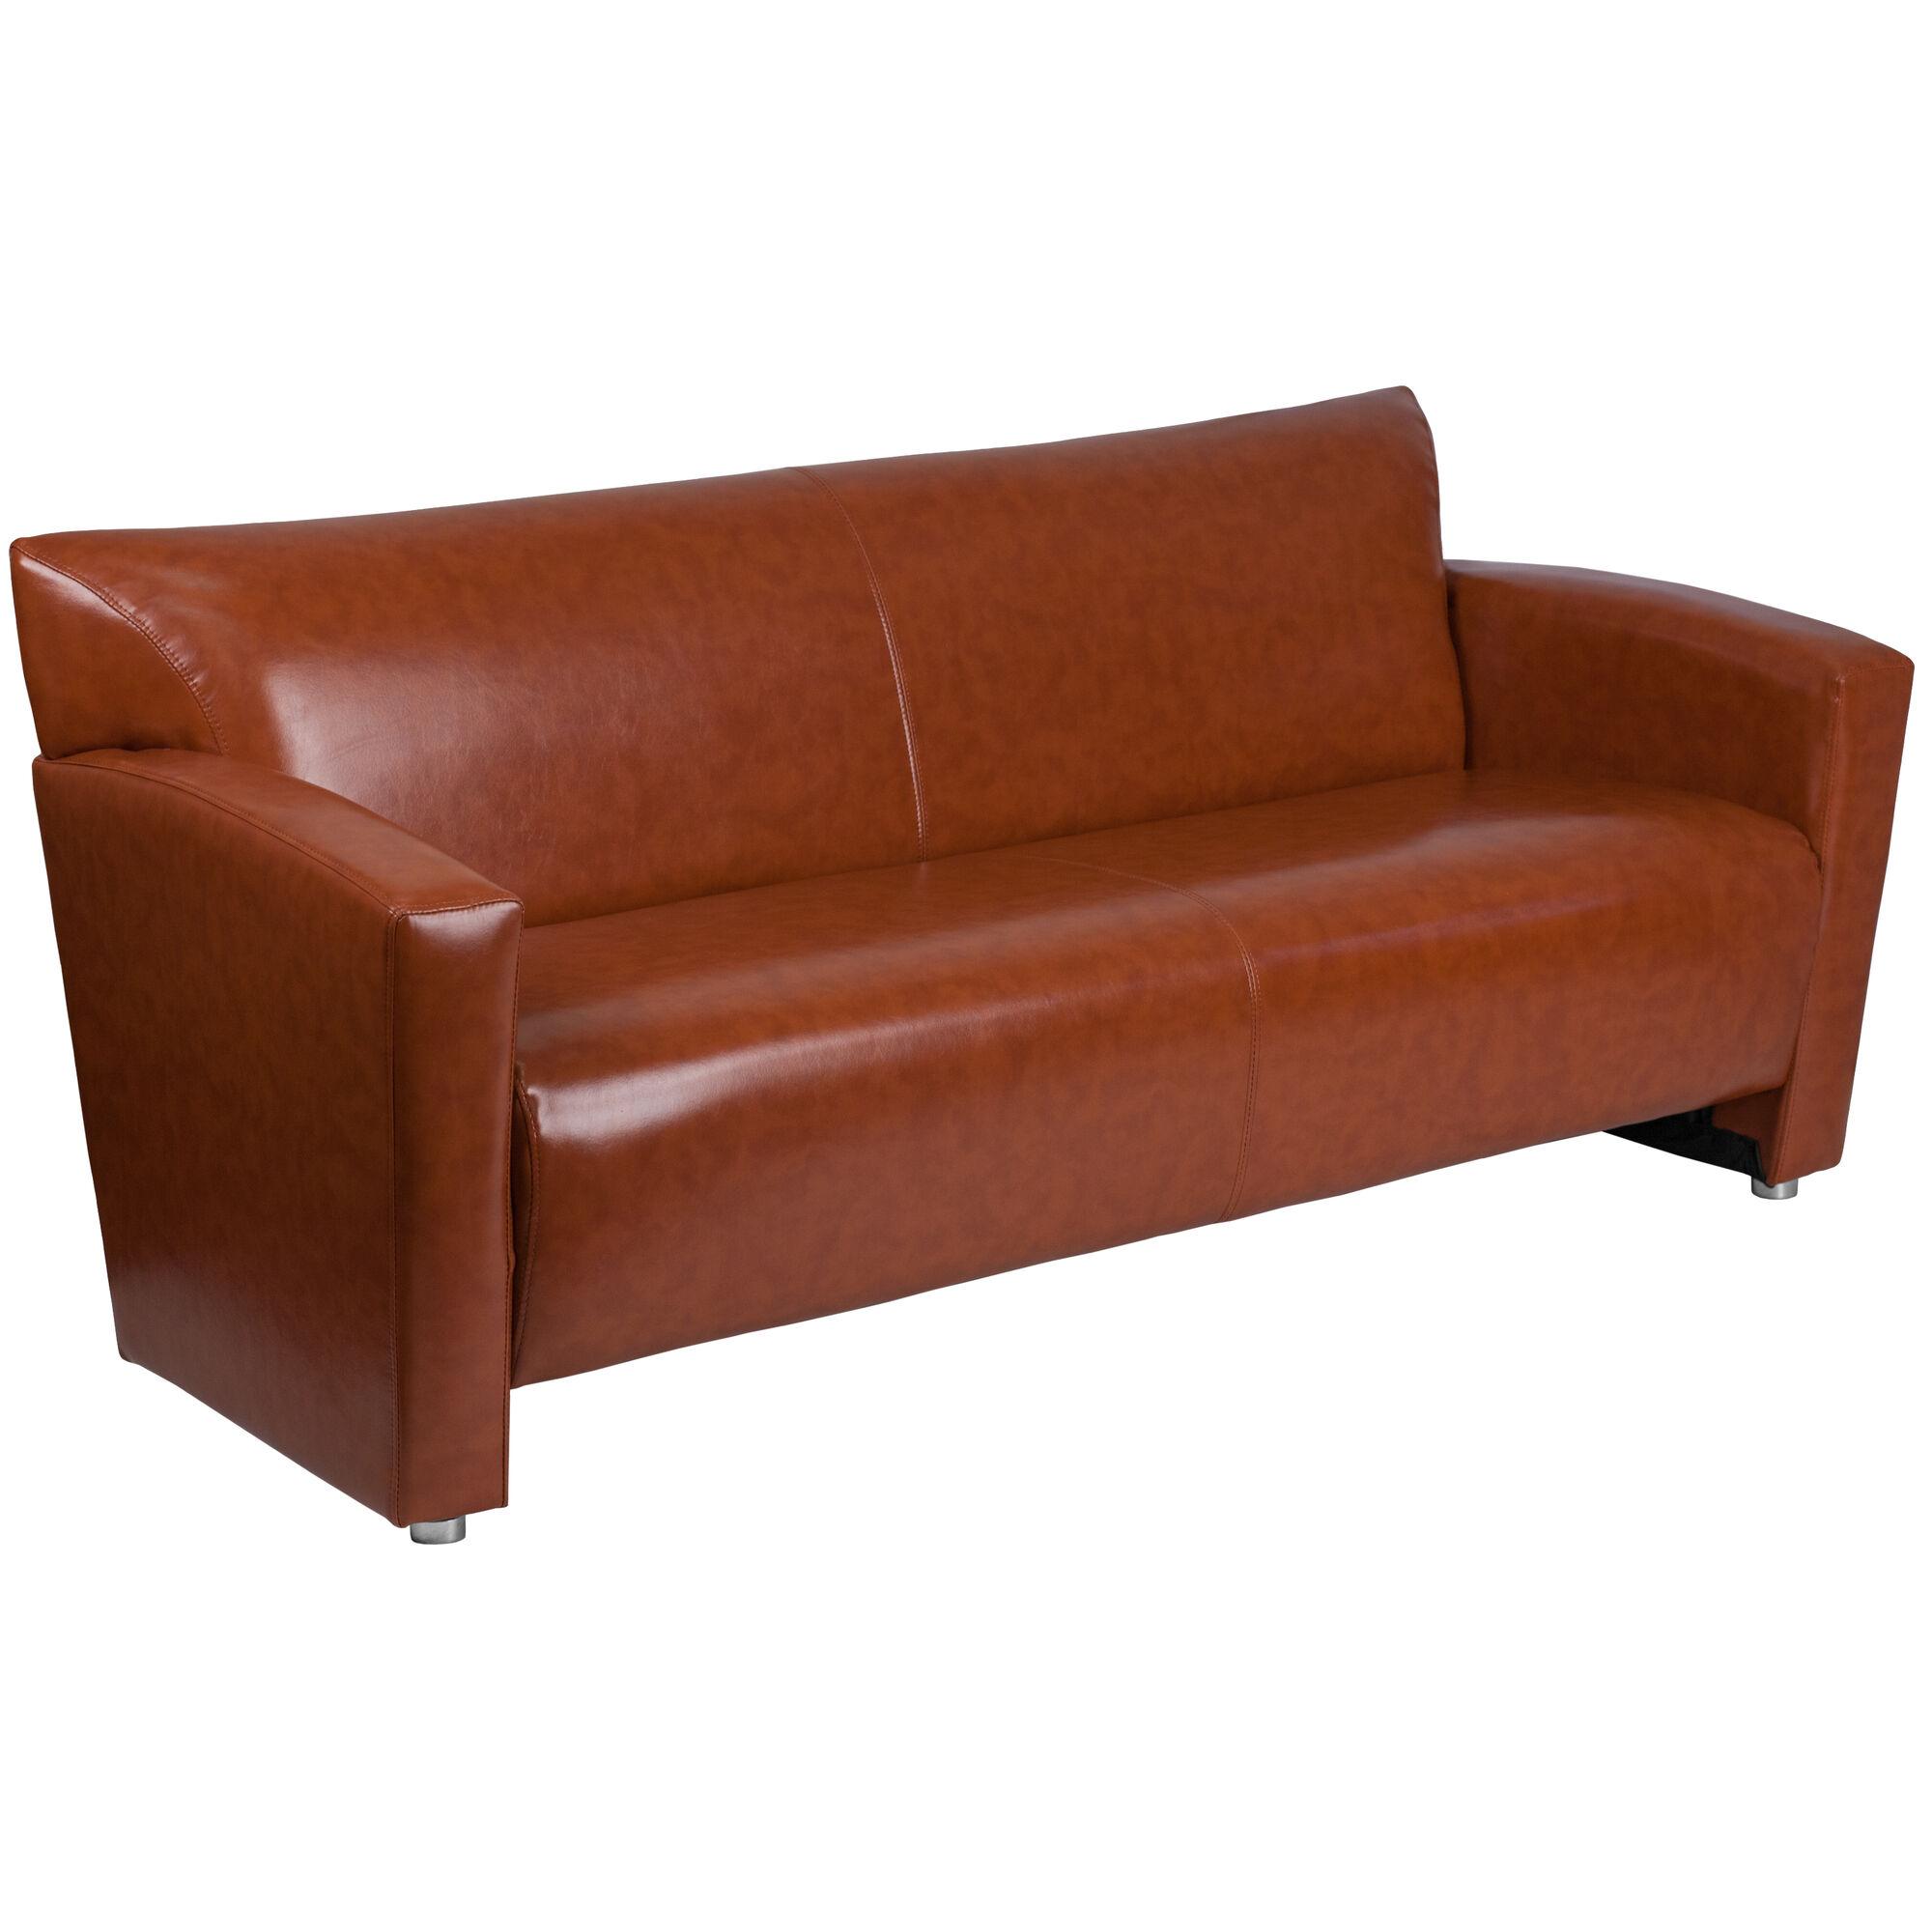 Cognac Leather Sofa 222 3 Cg Gg Bizchair Com